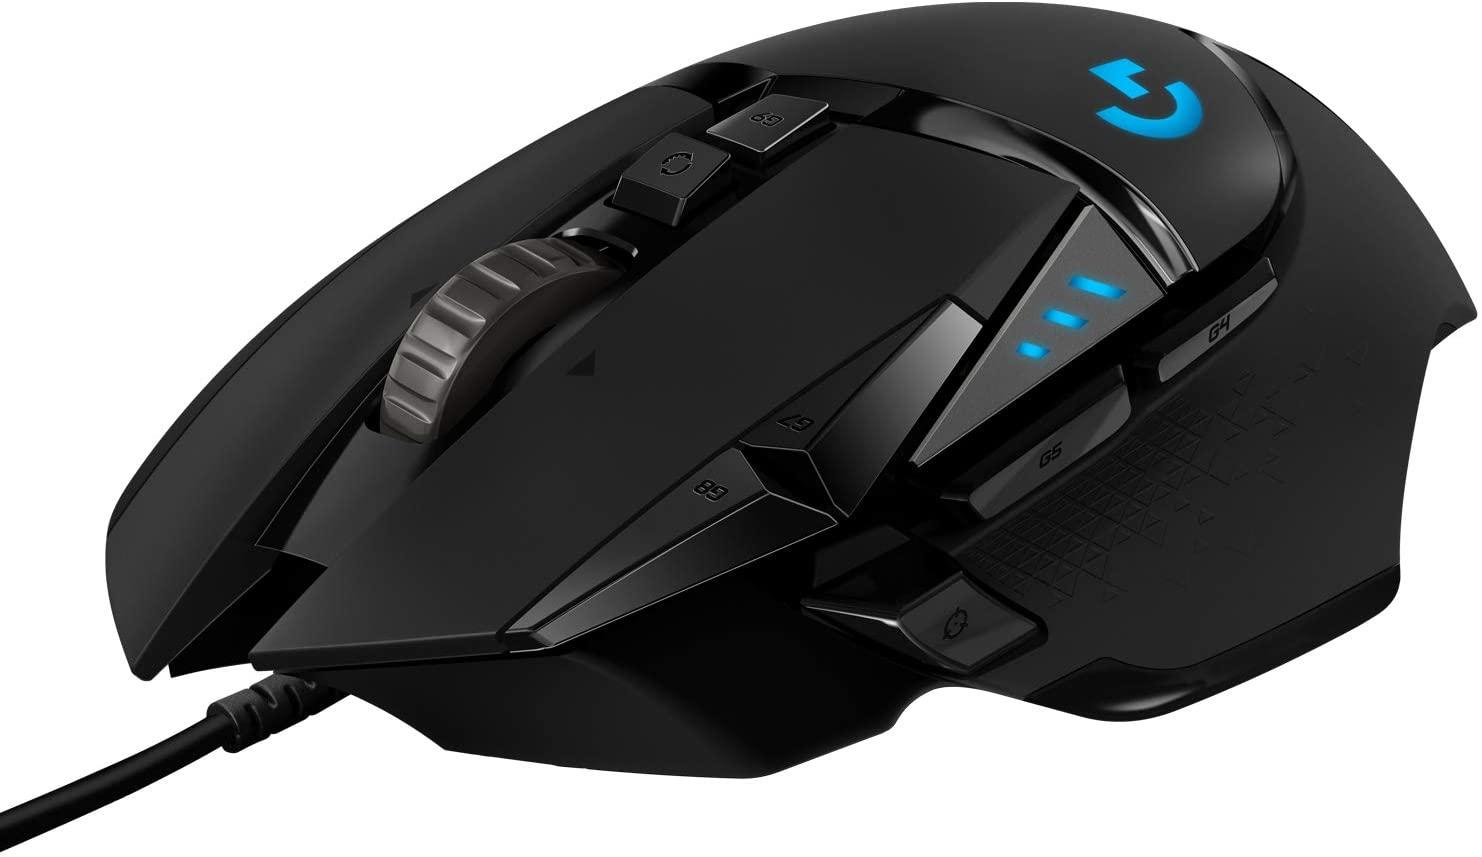 Ratón Gaming Logitech G502 HERO